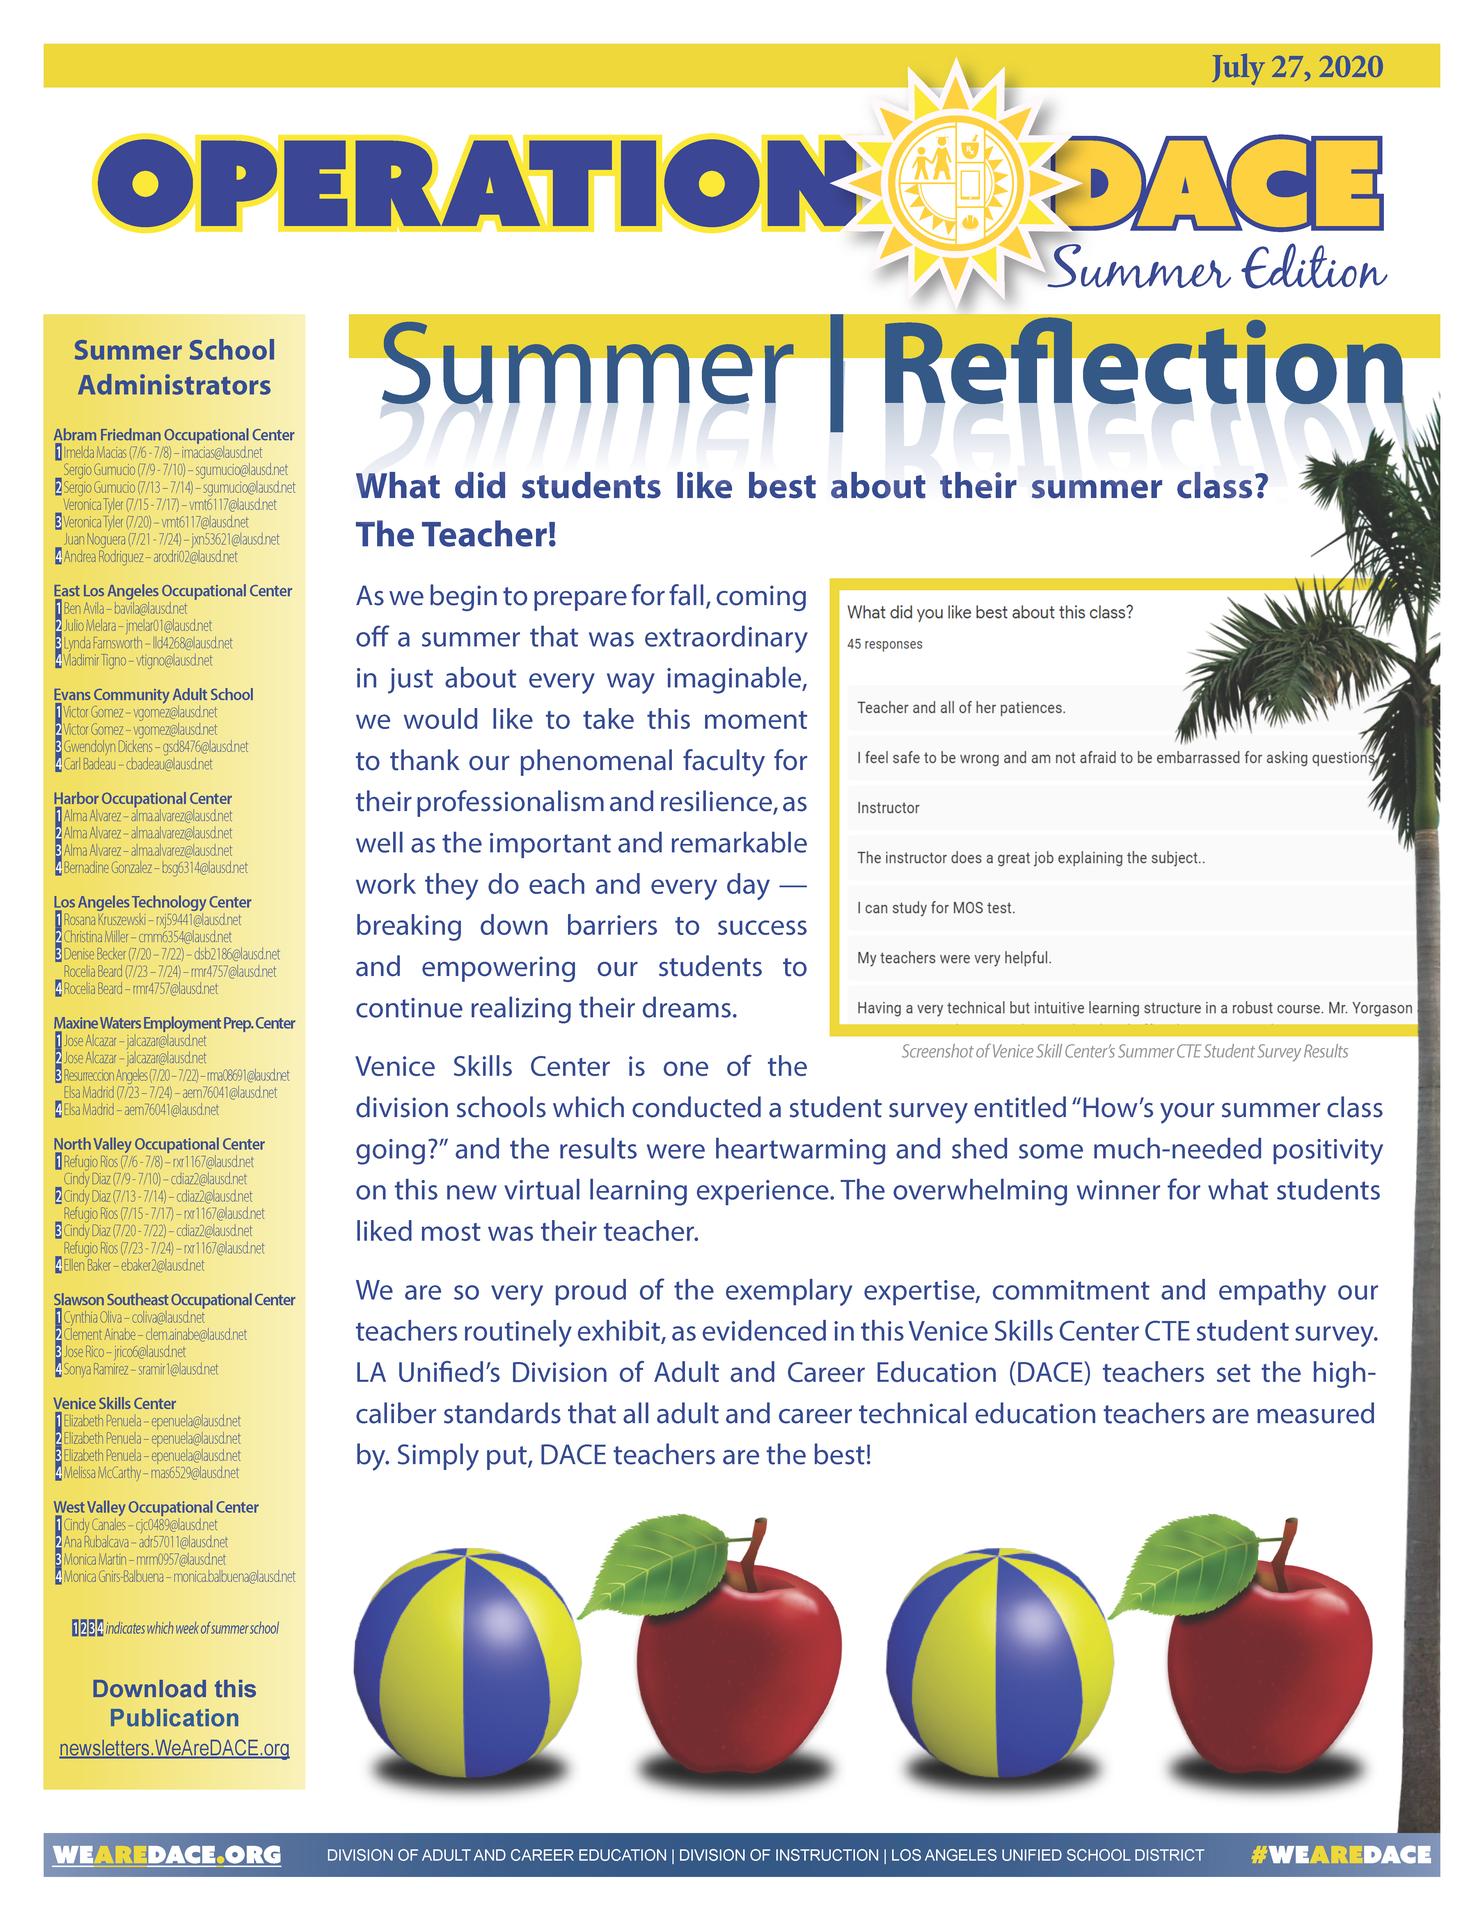 DACE Summer Newsletter - July 27, 2020 Thumbnail